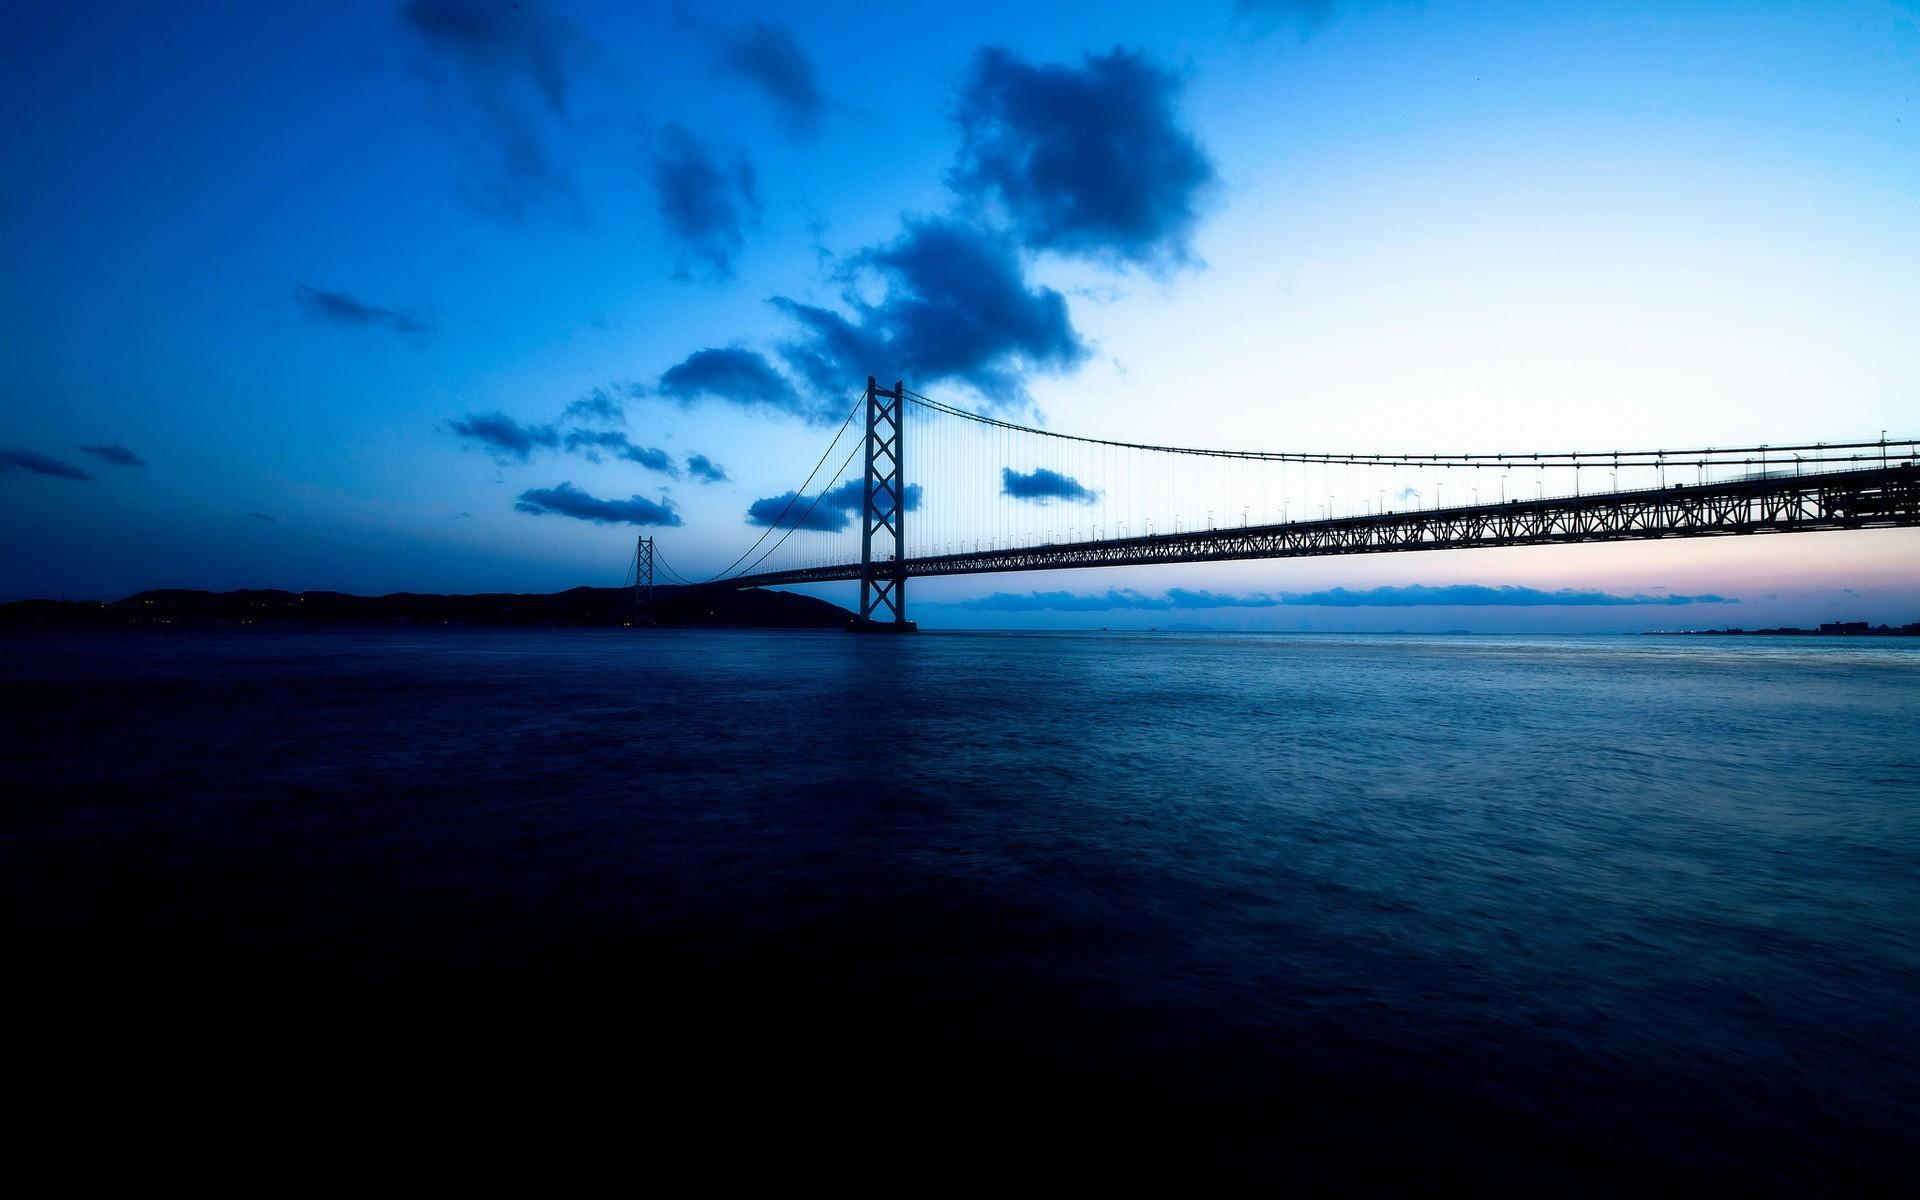 Bridge bridges ocean sea night sky clouds wallpaper     83128    WallpaperUP